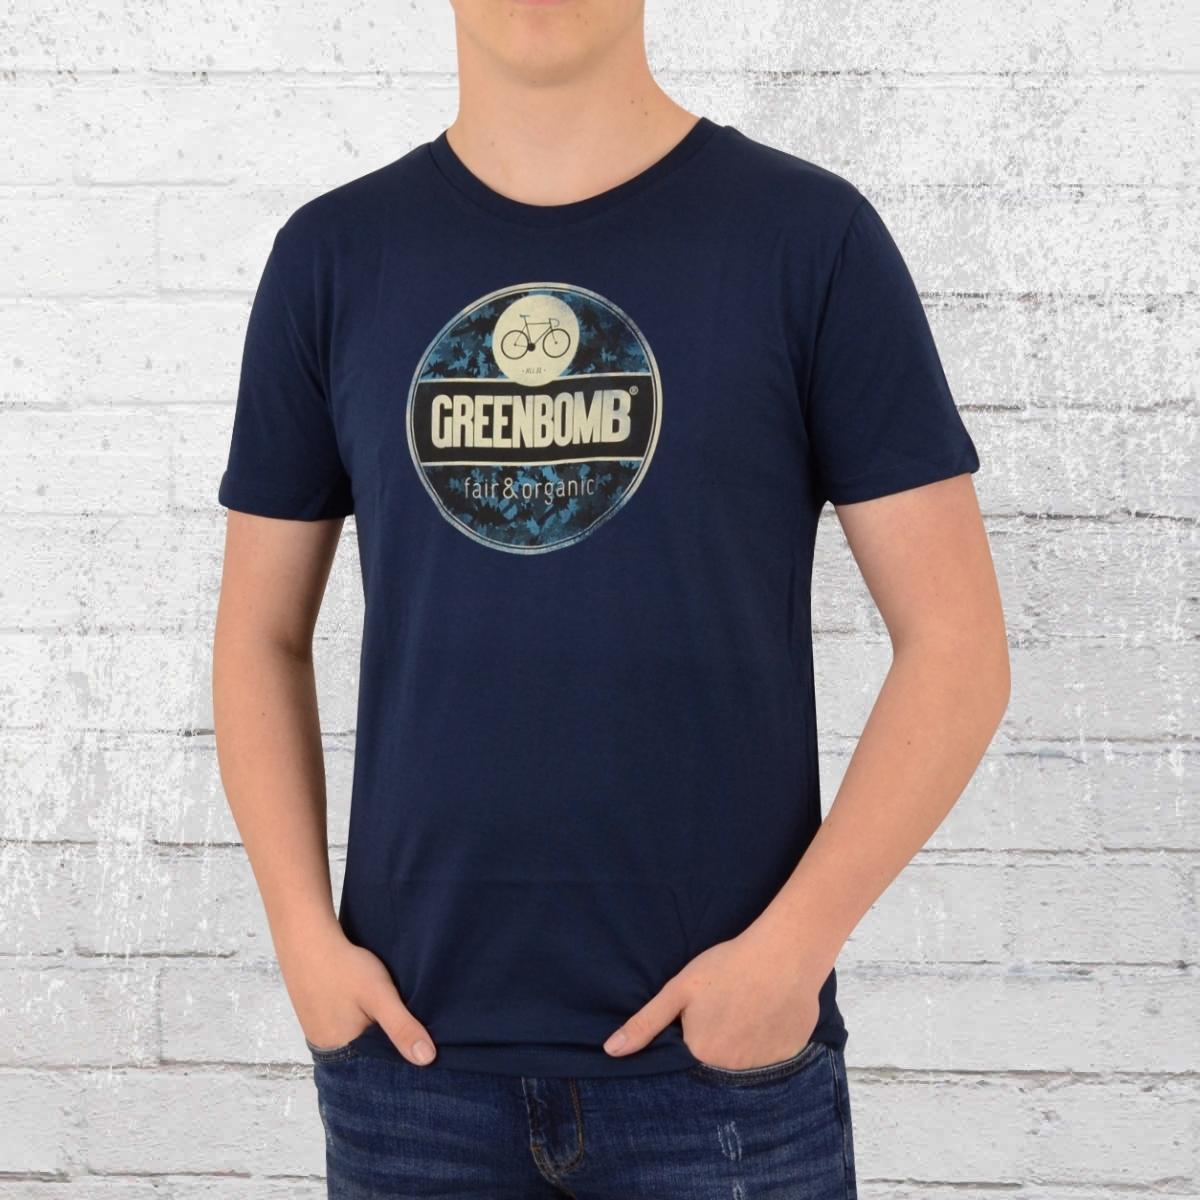 Greenbomb Herren Fahrrad T-Shirt Bike Emblem blau